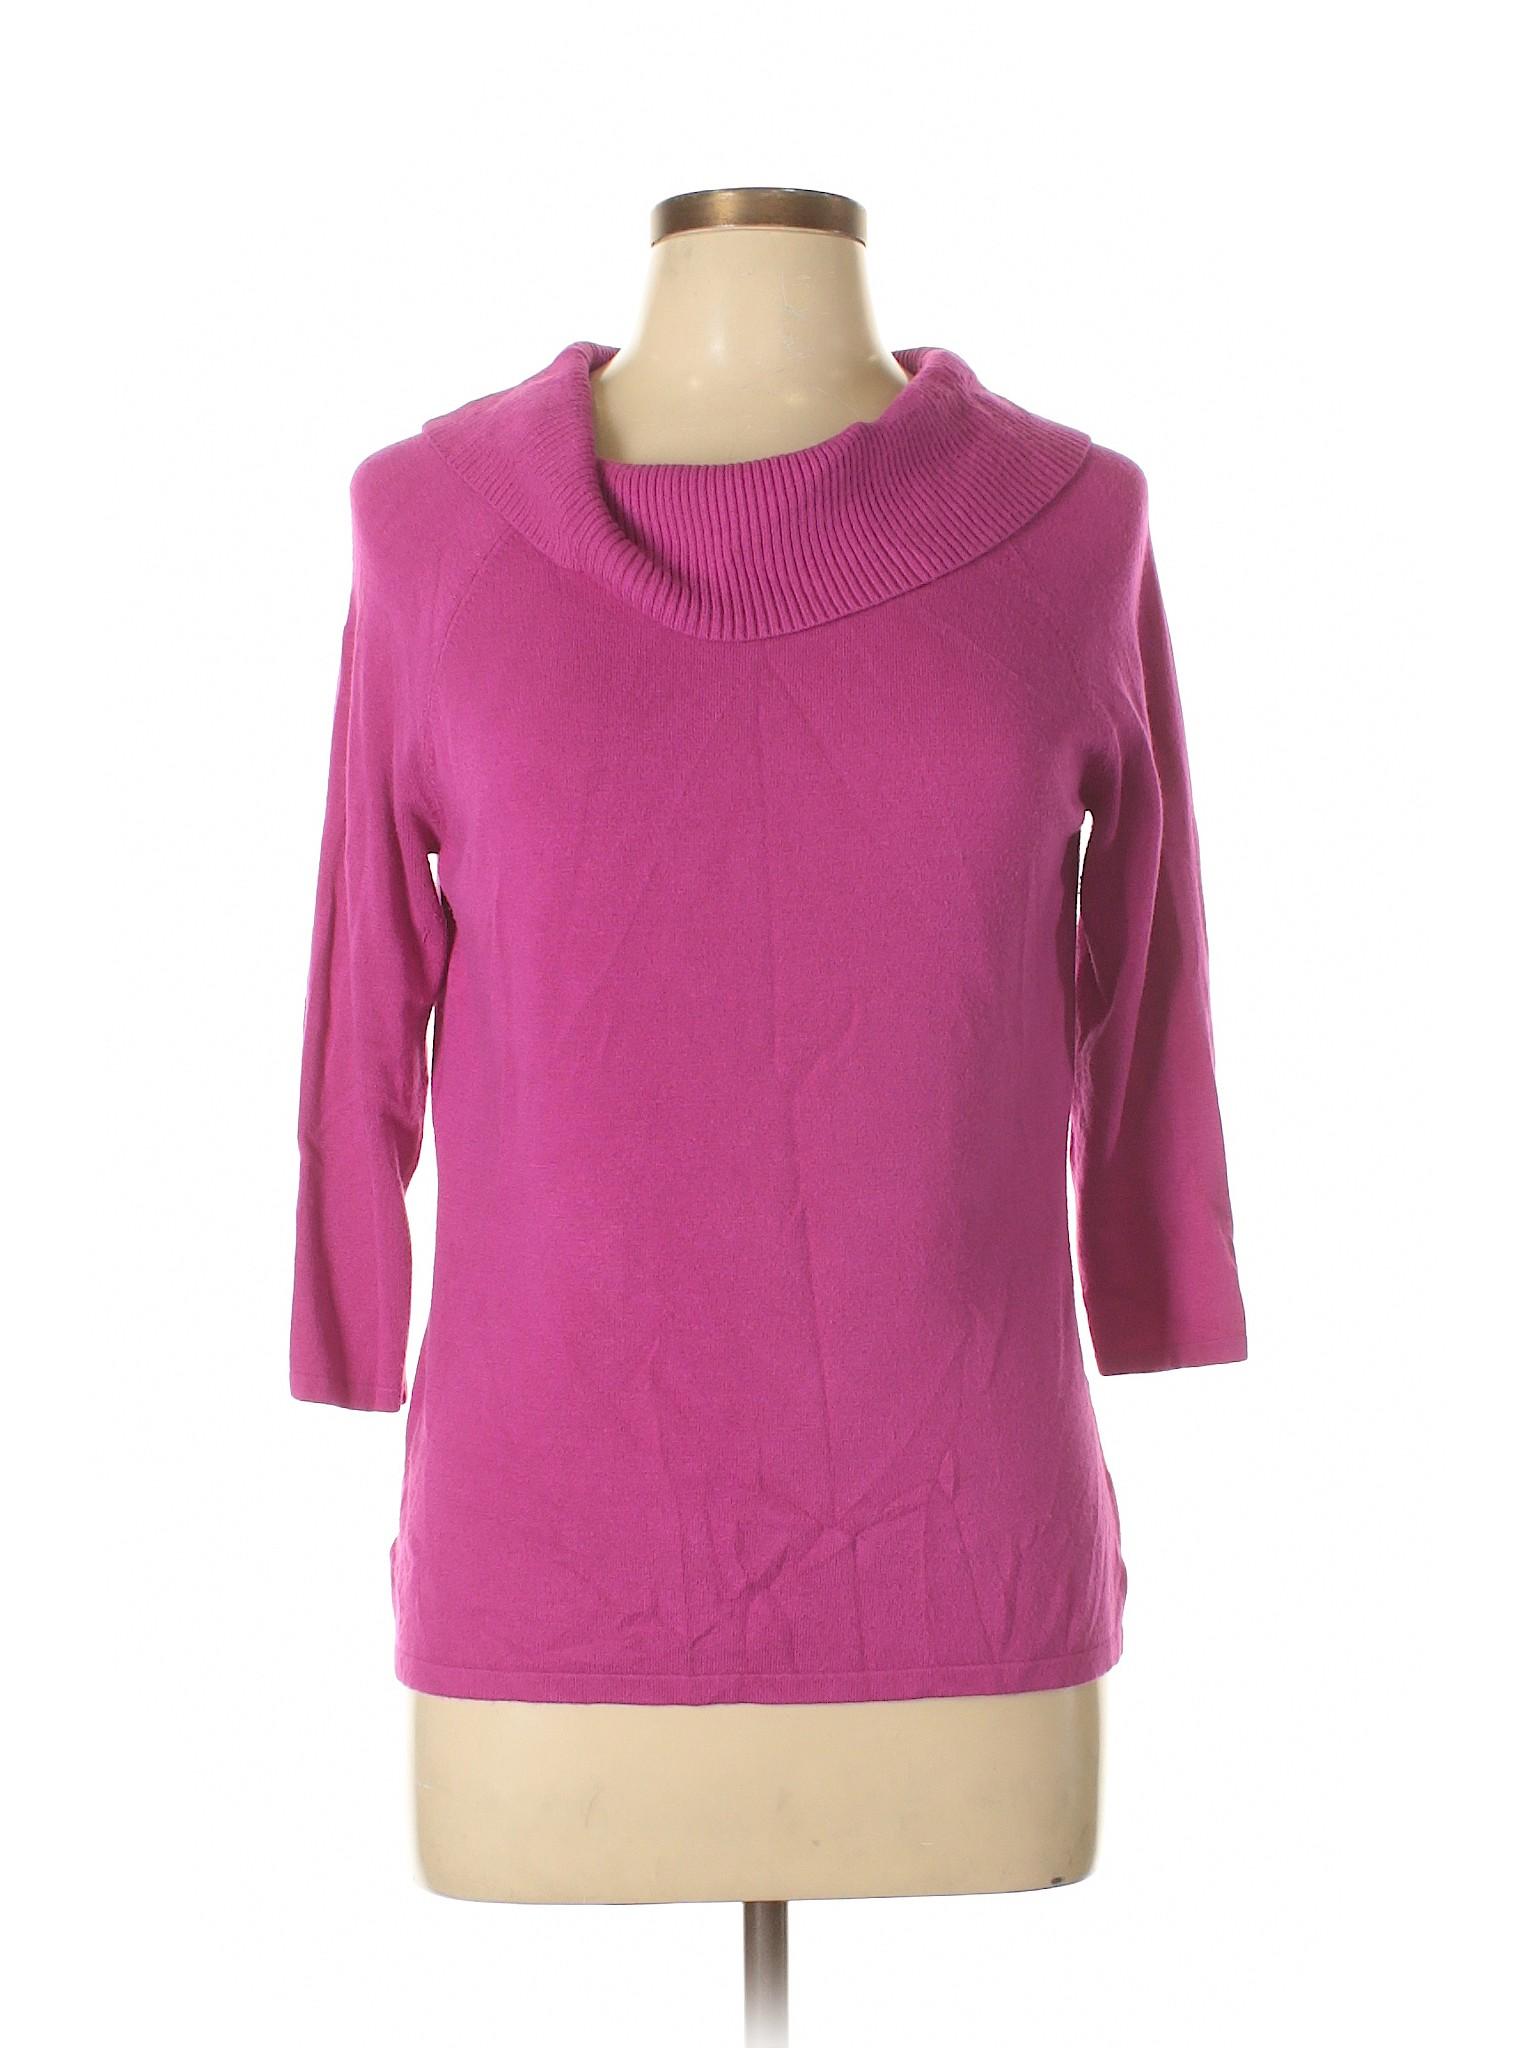 Ann Sweater Pullover Taylor winter Boutique axR61Bn5